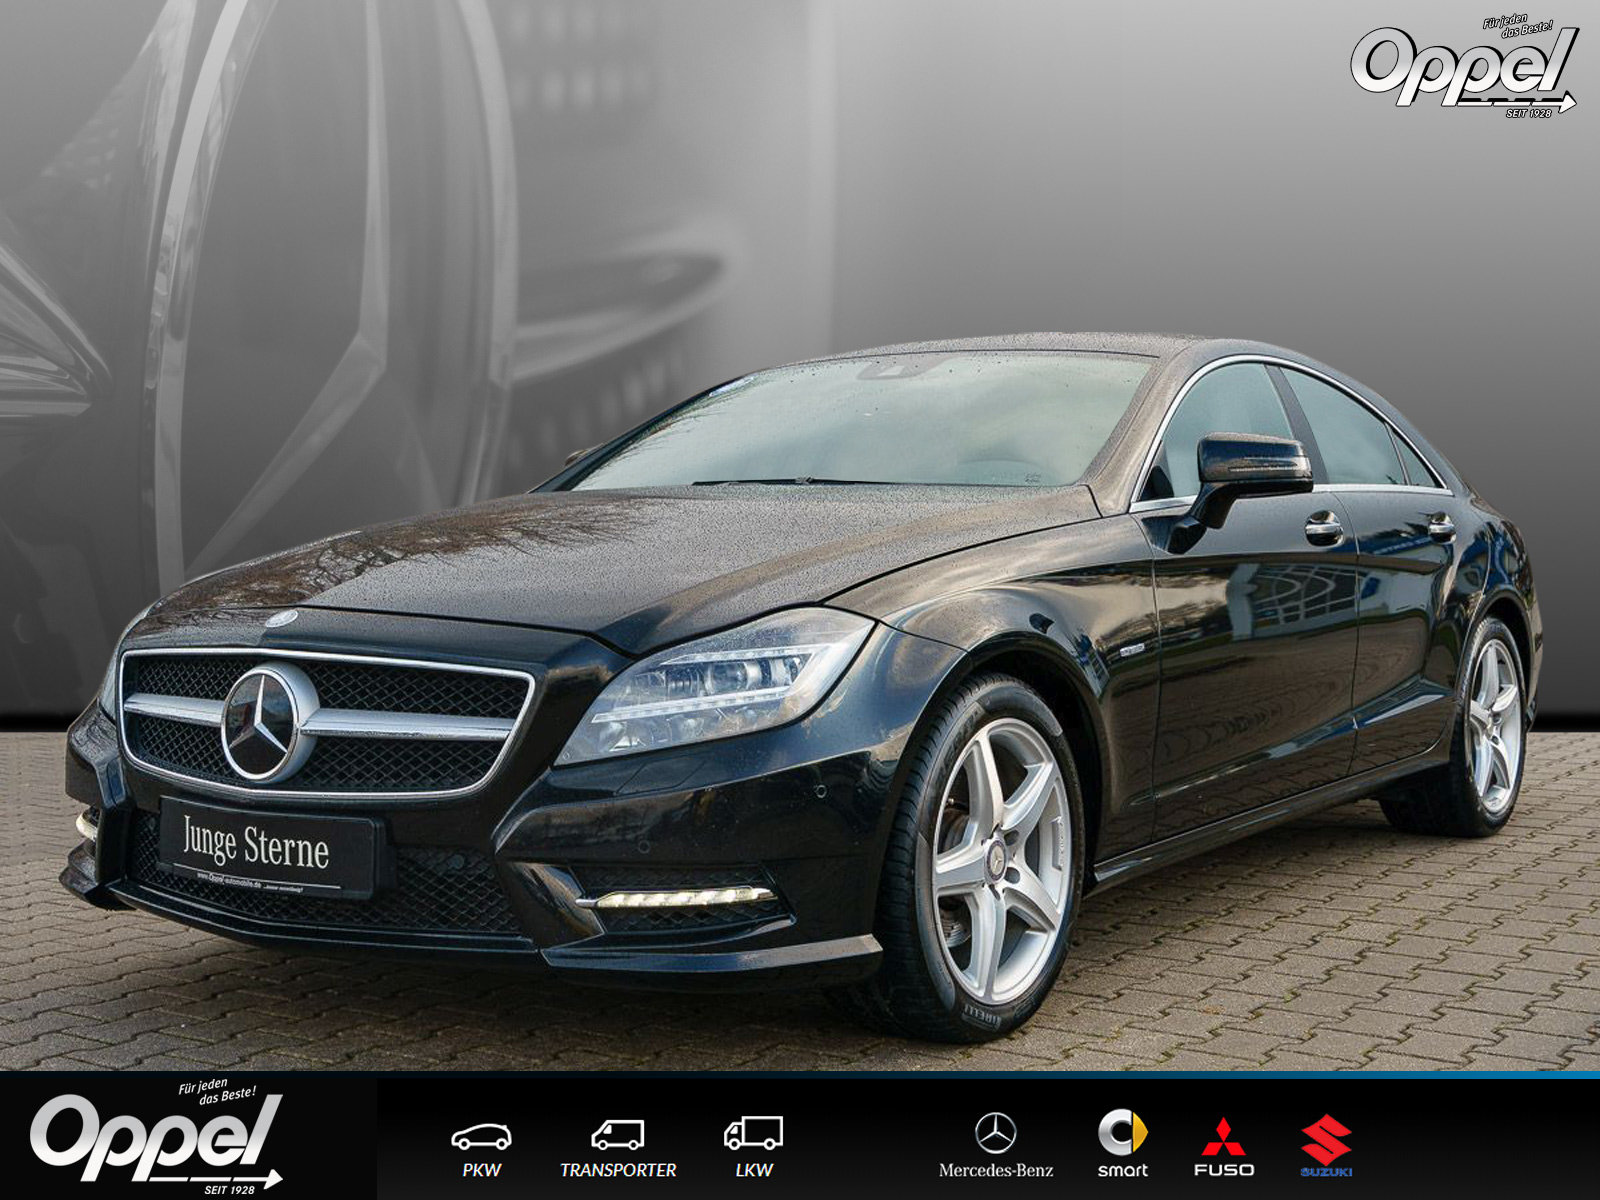 Mercedes-Benz CLS 350 CDI +XENON+Navi+Parktronic+Kamera+SD+LM+, Jahr 2012, diesel